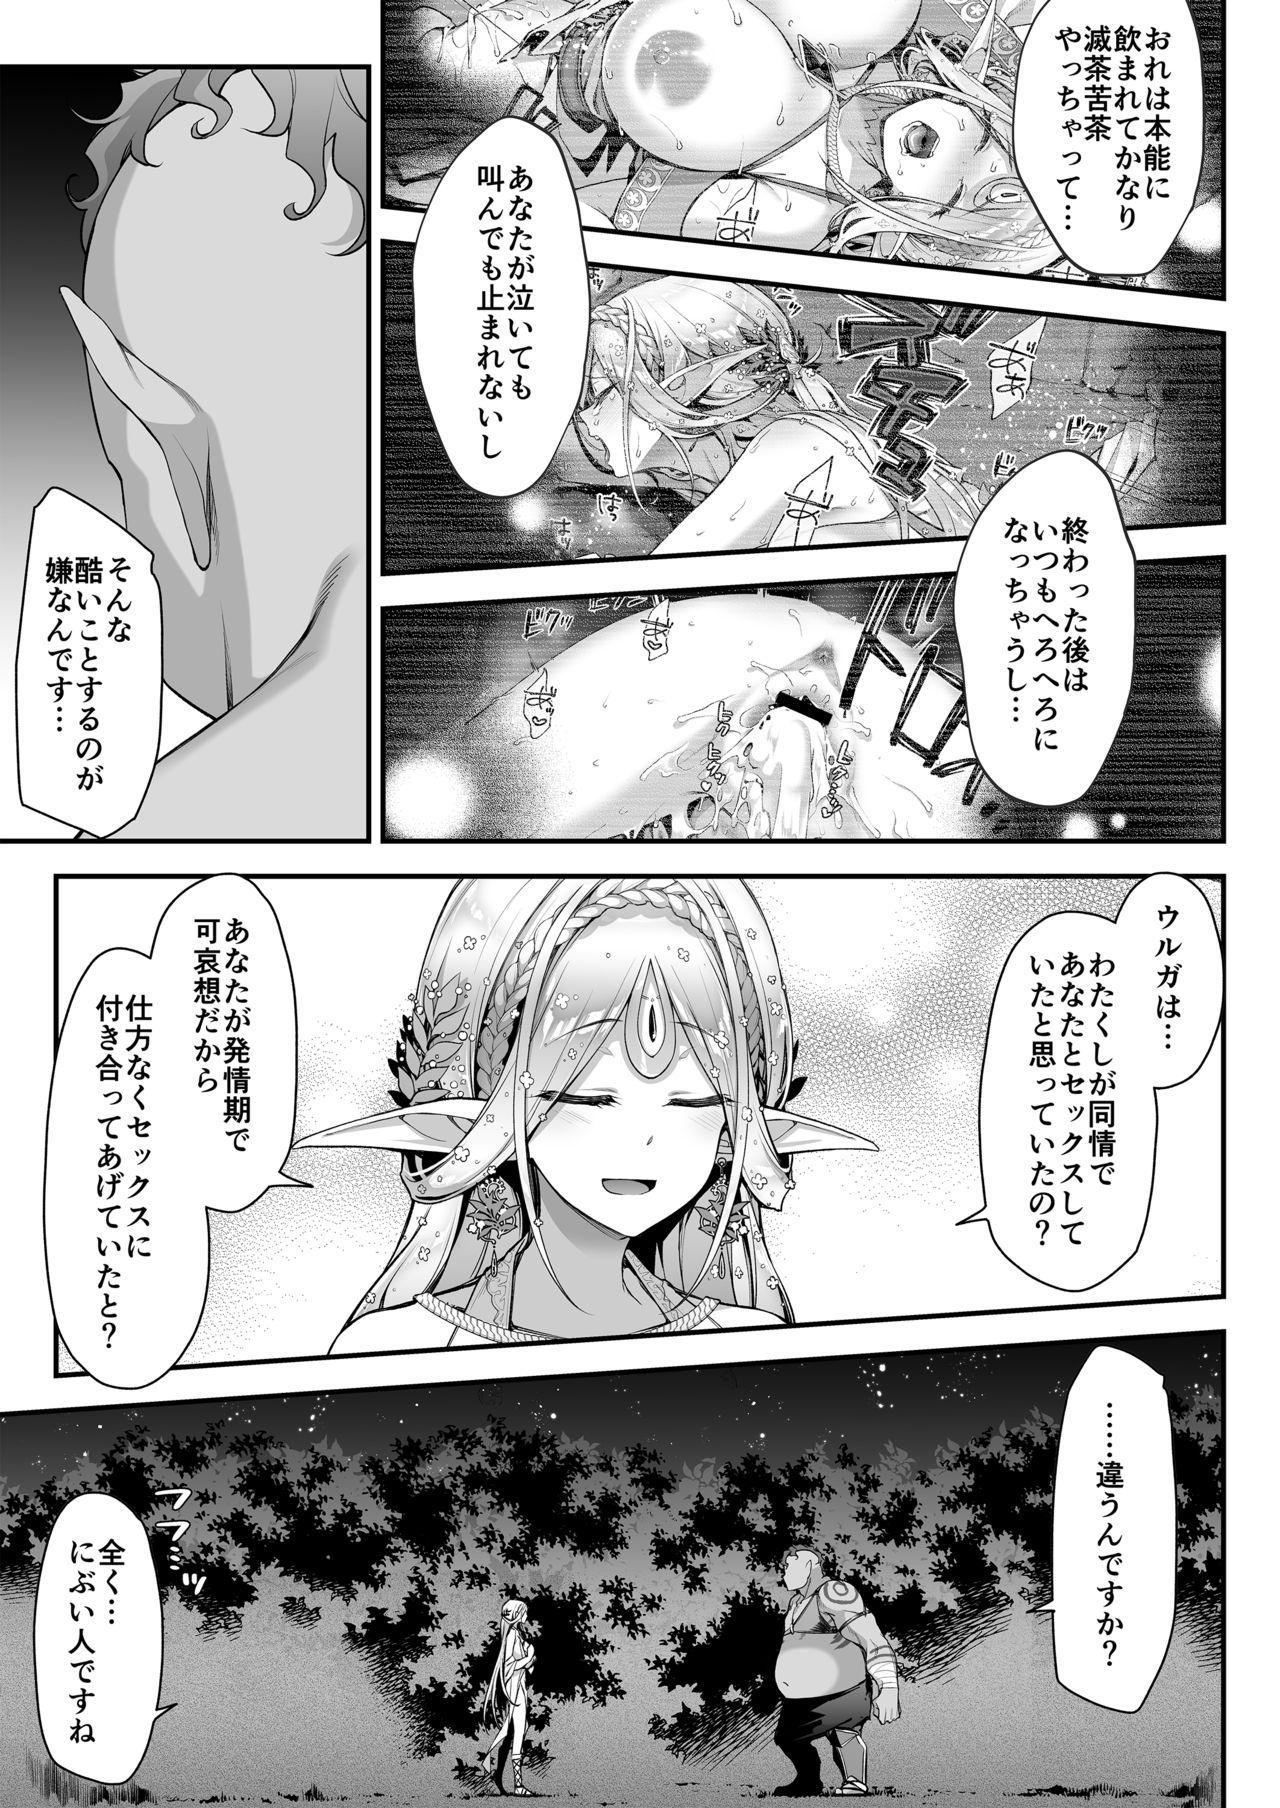 [Ichinose Land] Midara na Elf-san wa Orc-kun ga Osuki [Digital] 17